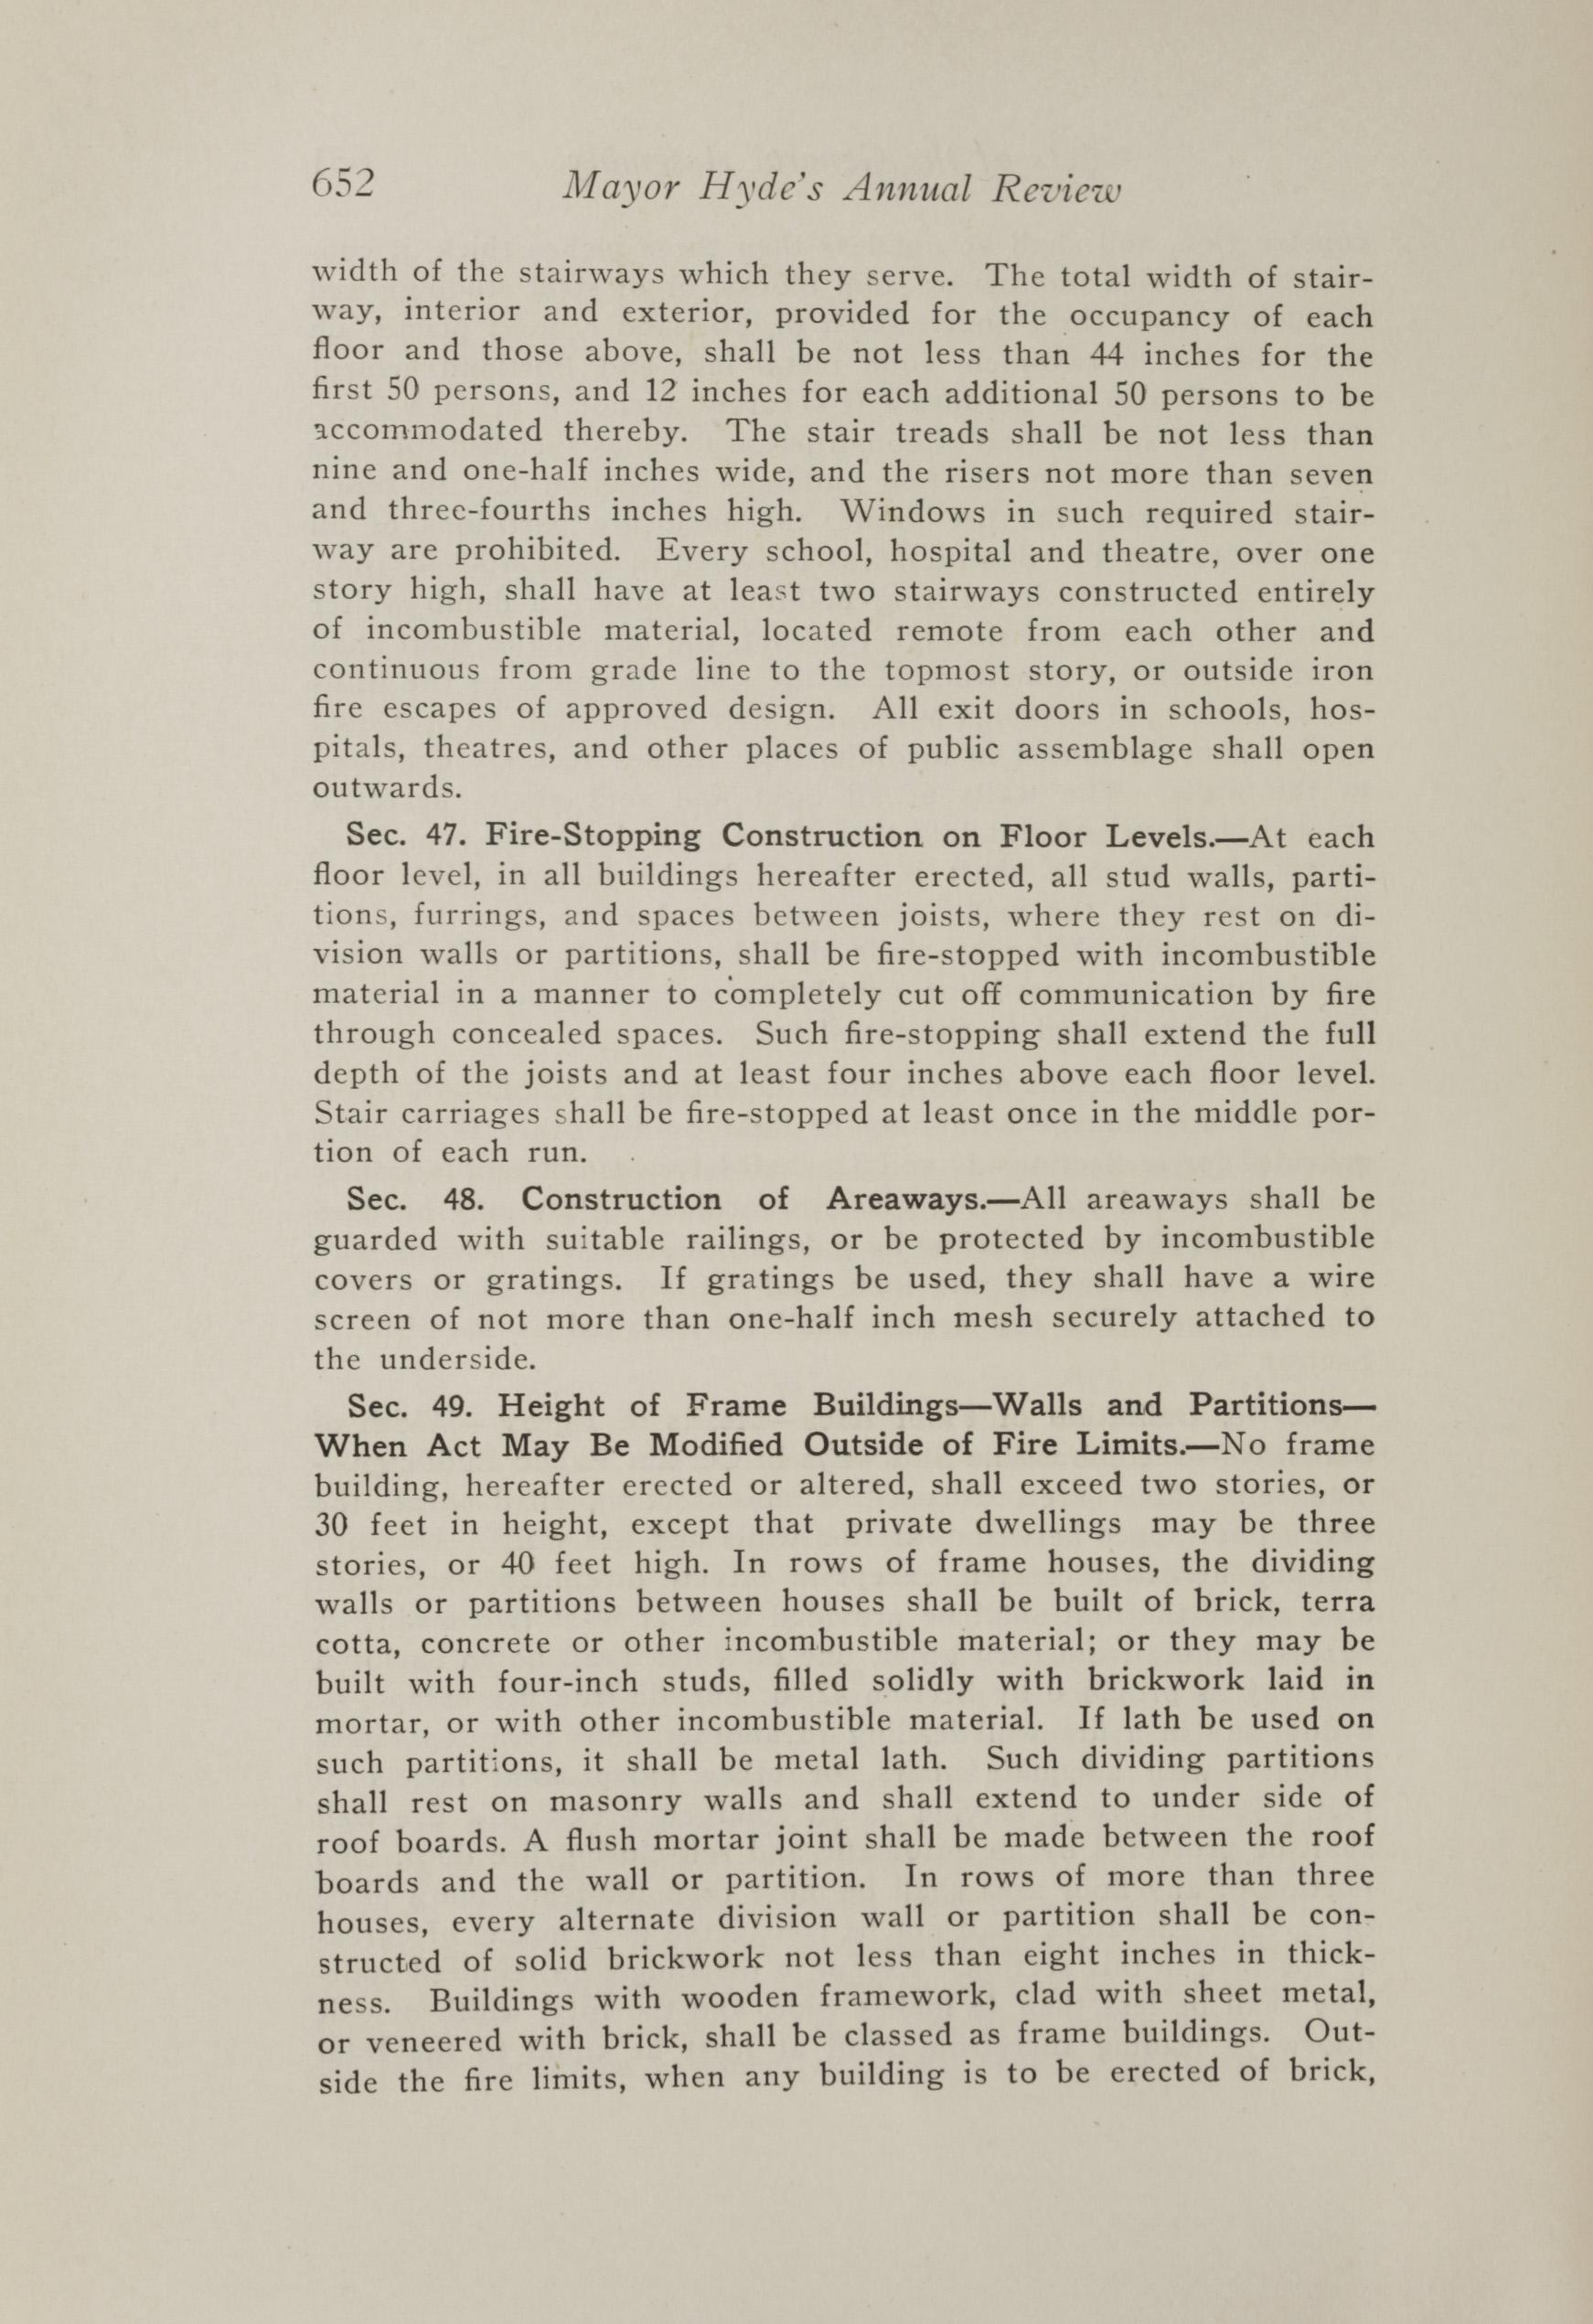 Charleston Yearbook, 1917, page 652